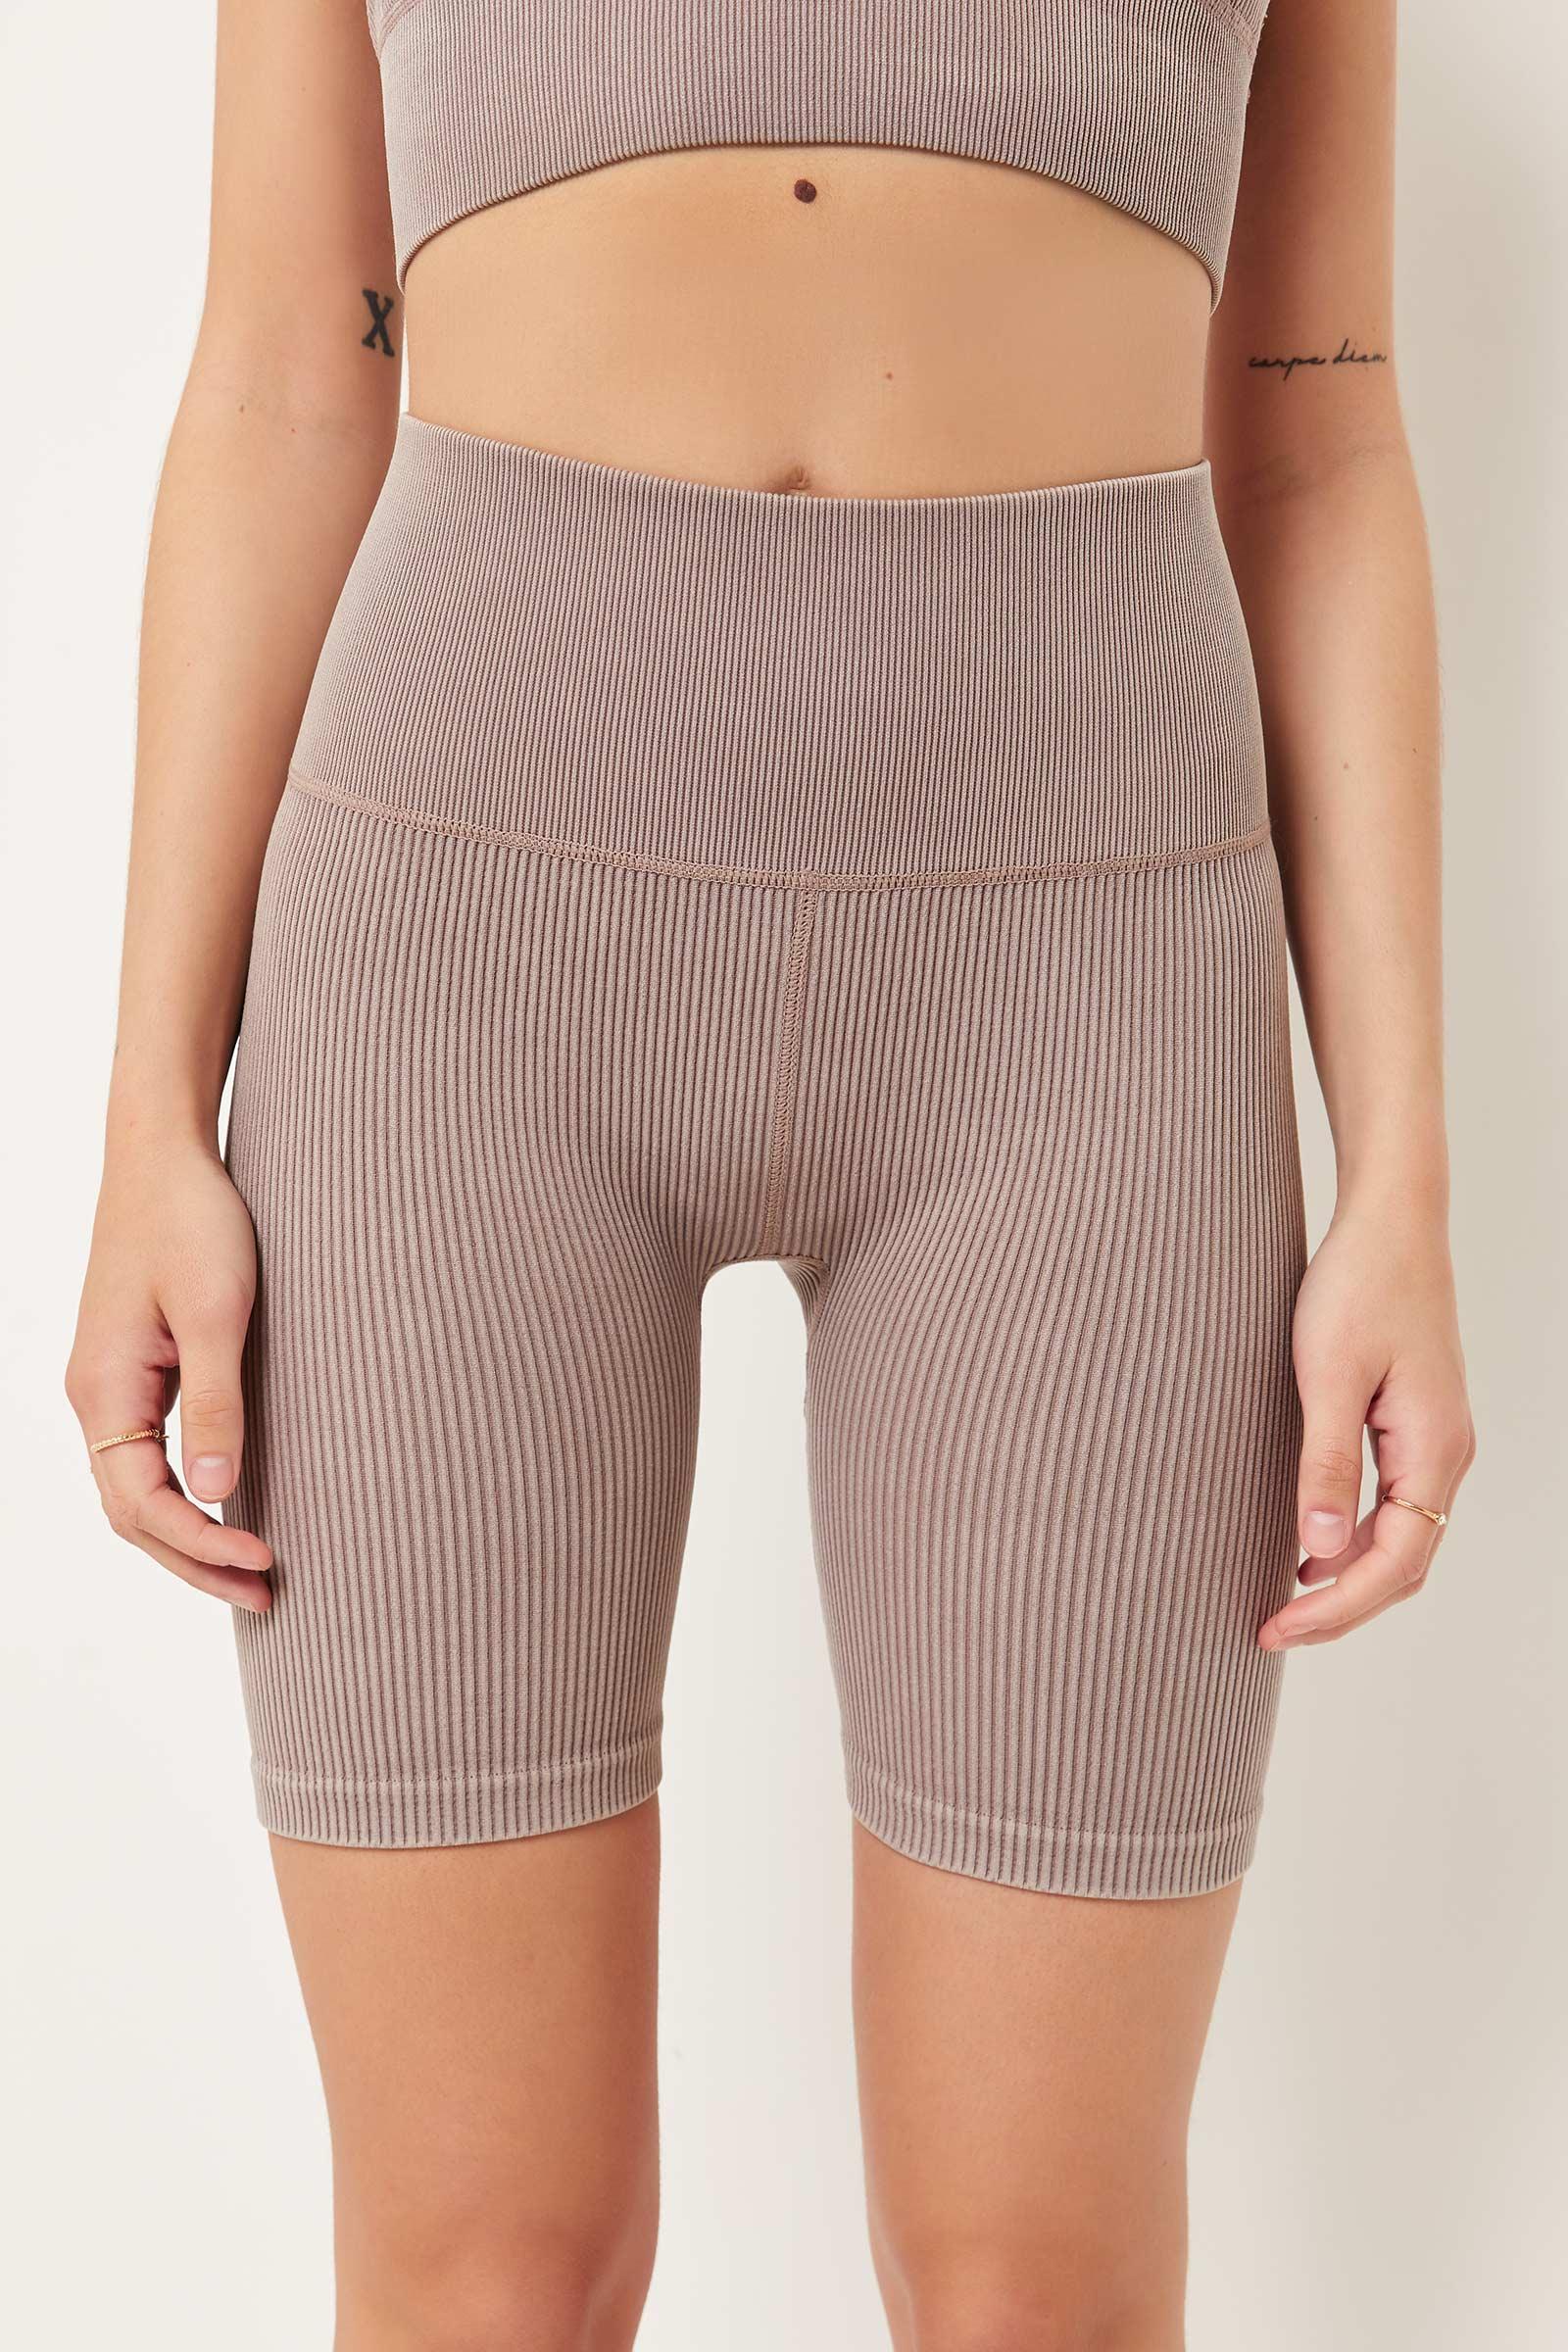 MOVE Seamless Biker Shorts